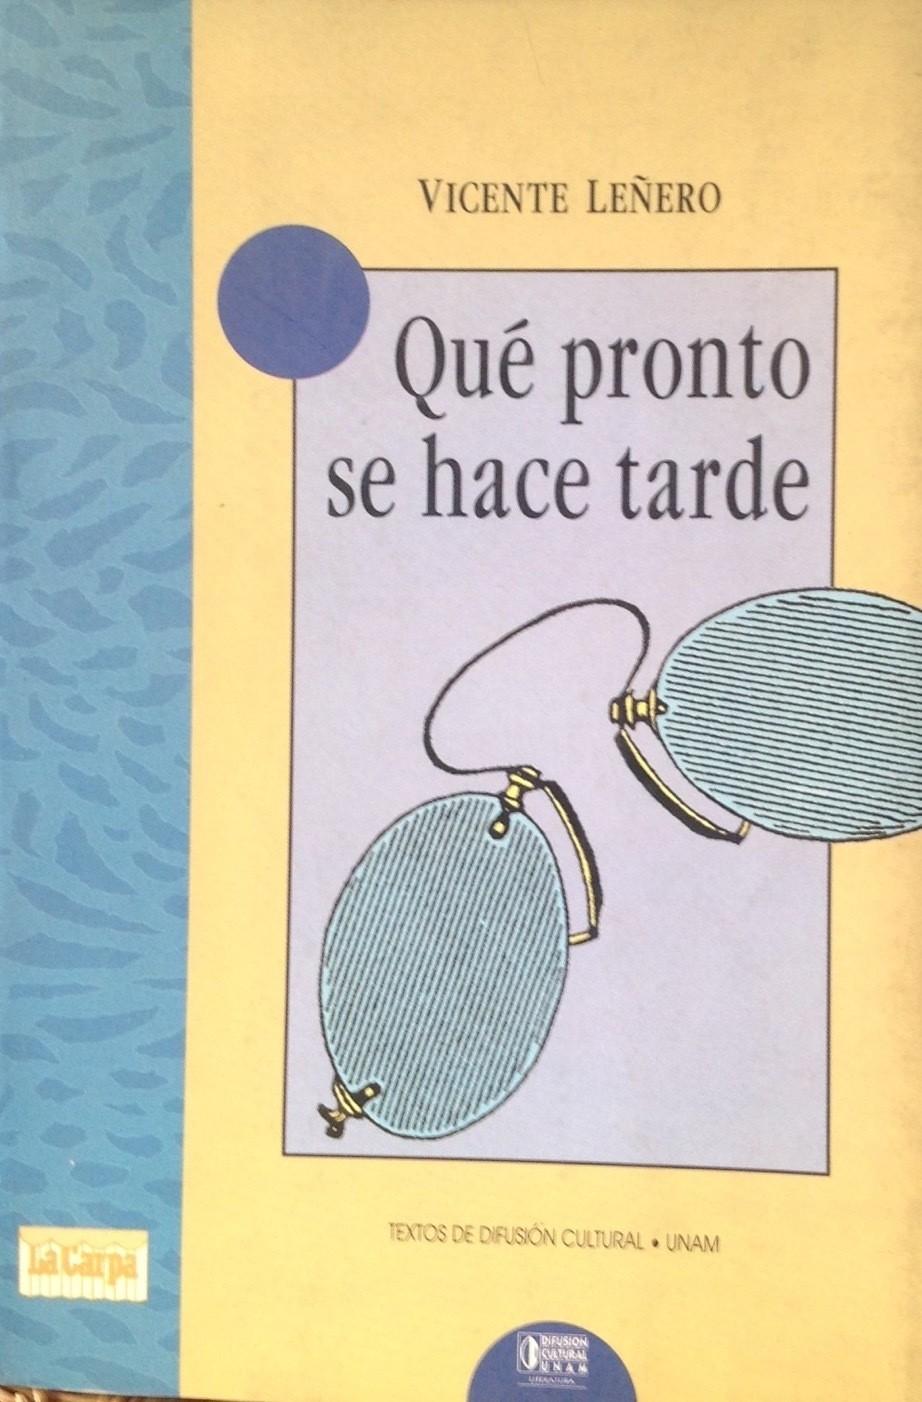 Vicente Leñero, Qué pronto se hace tarde